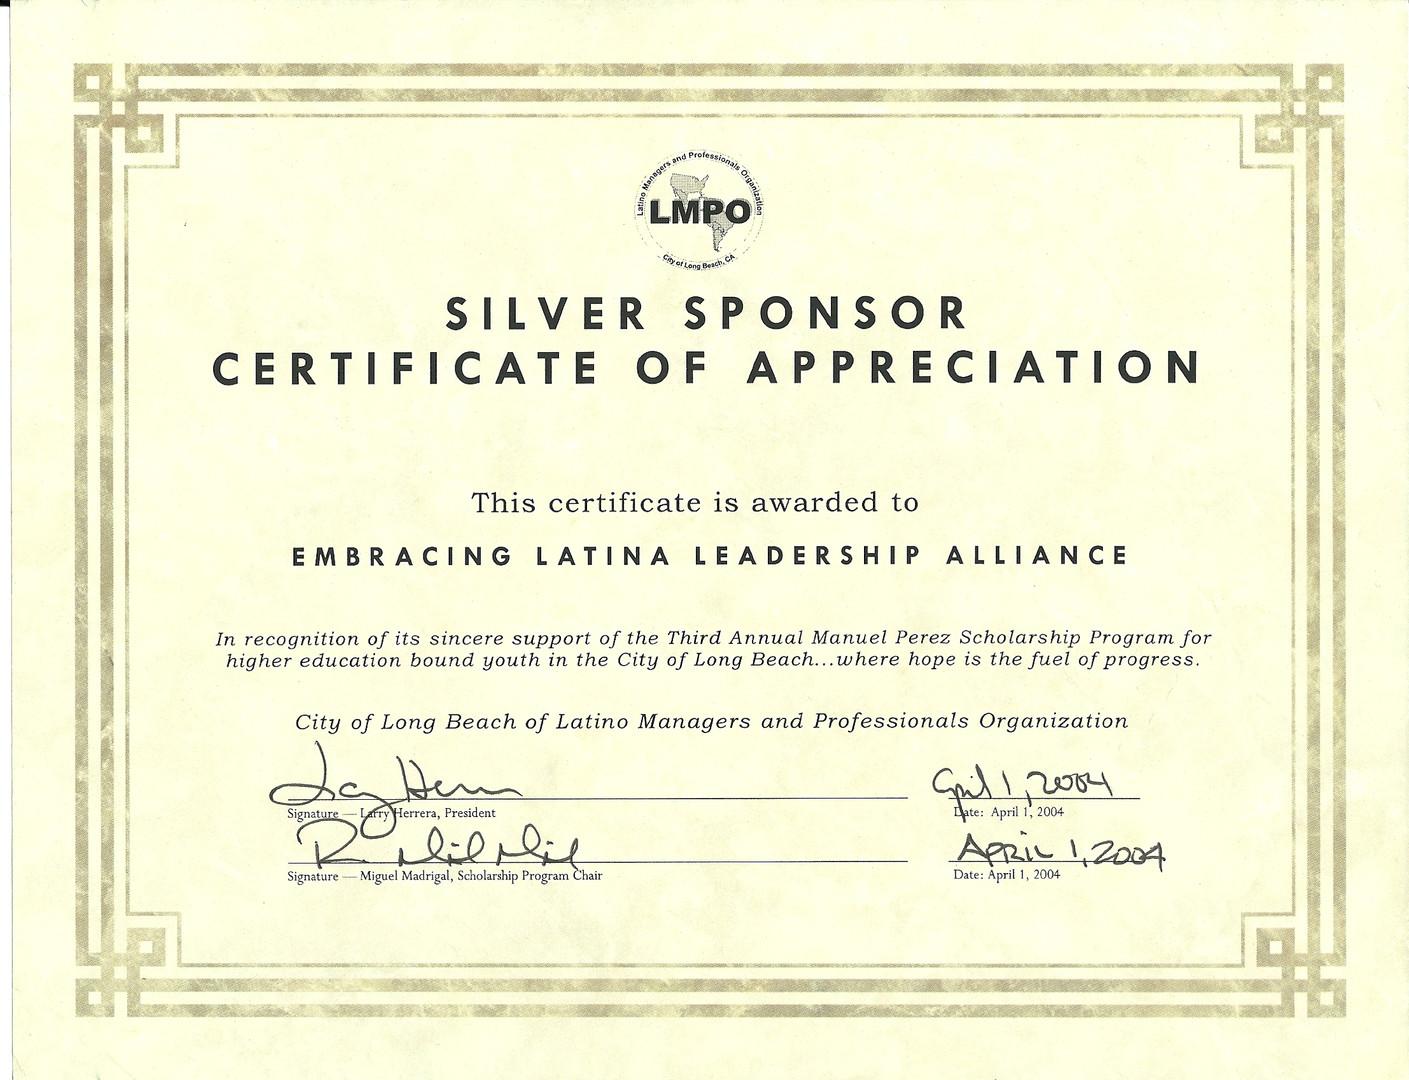 2004 Silver Sponsor Certificate of Appre